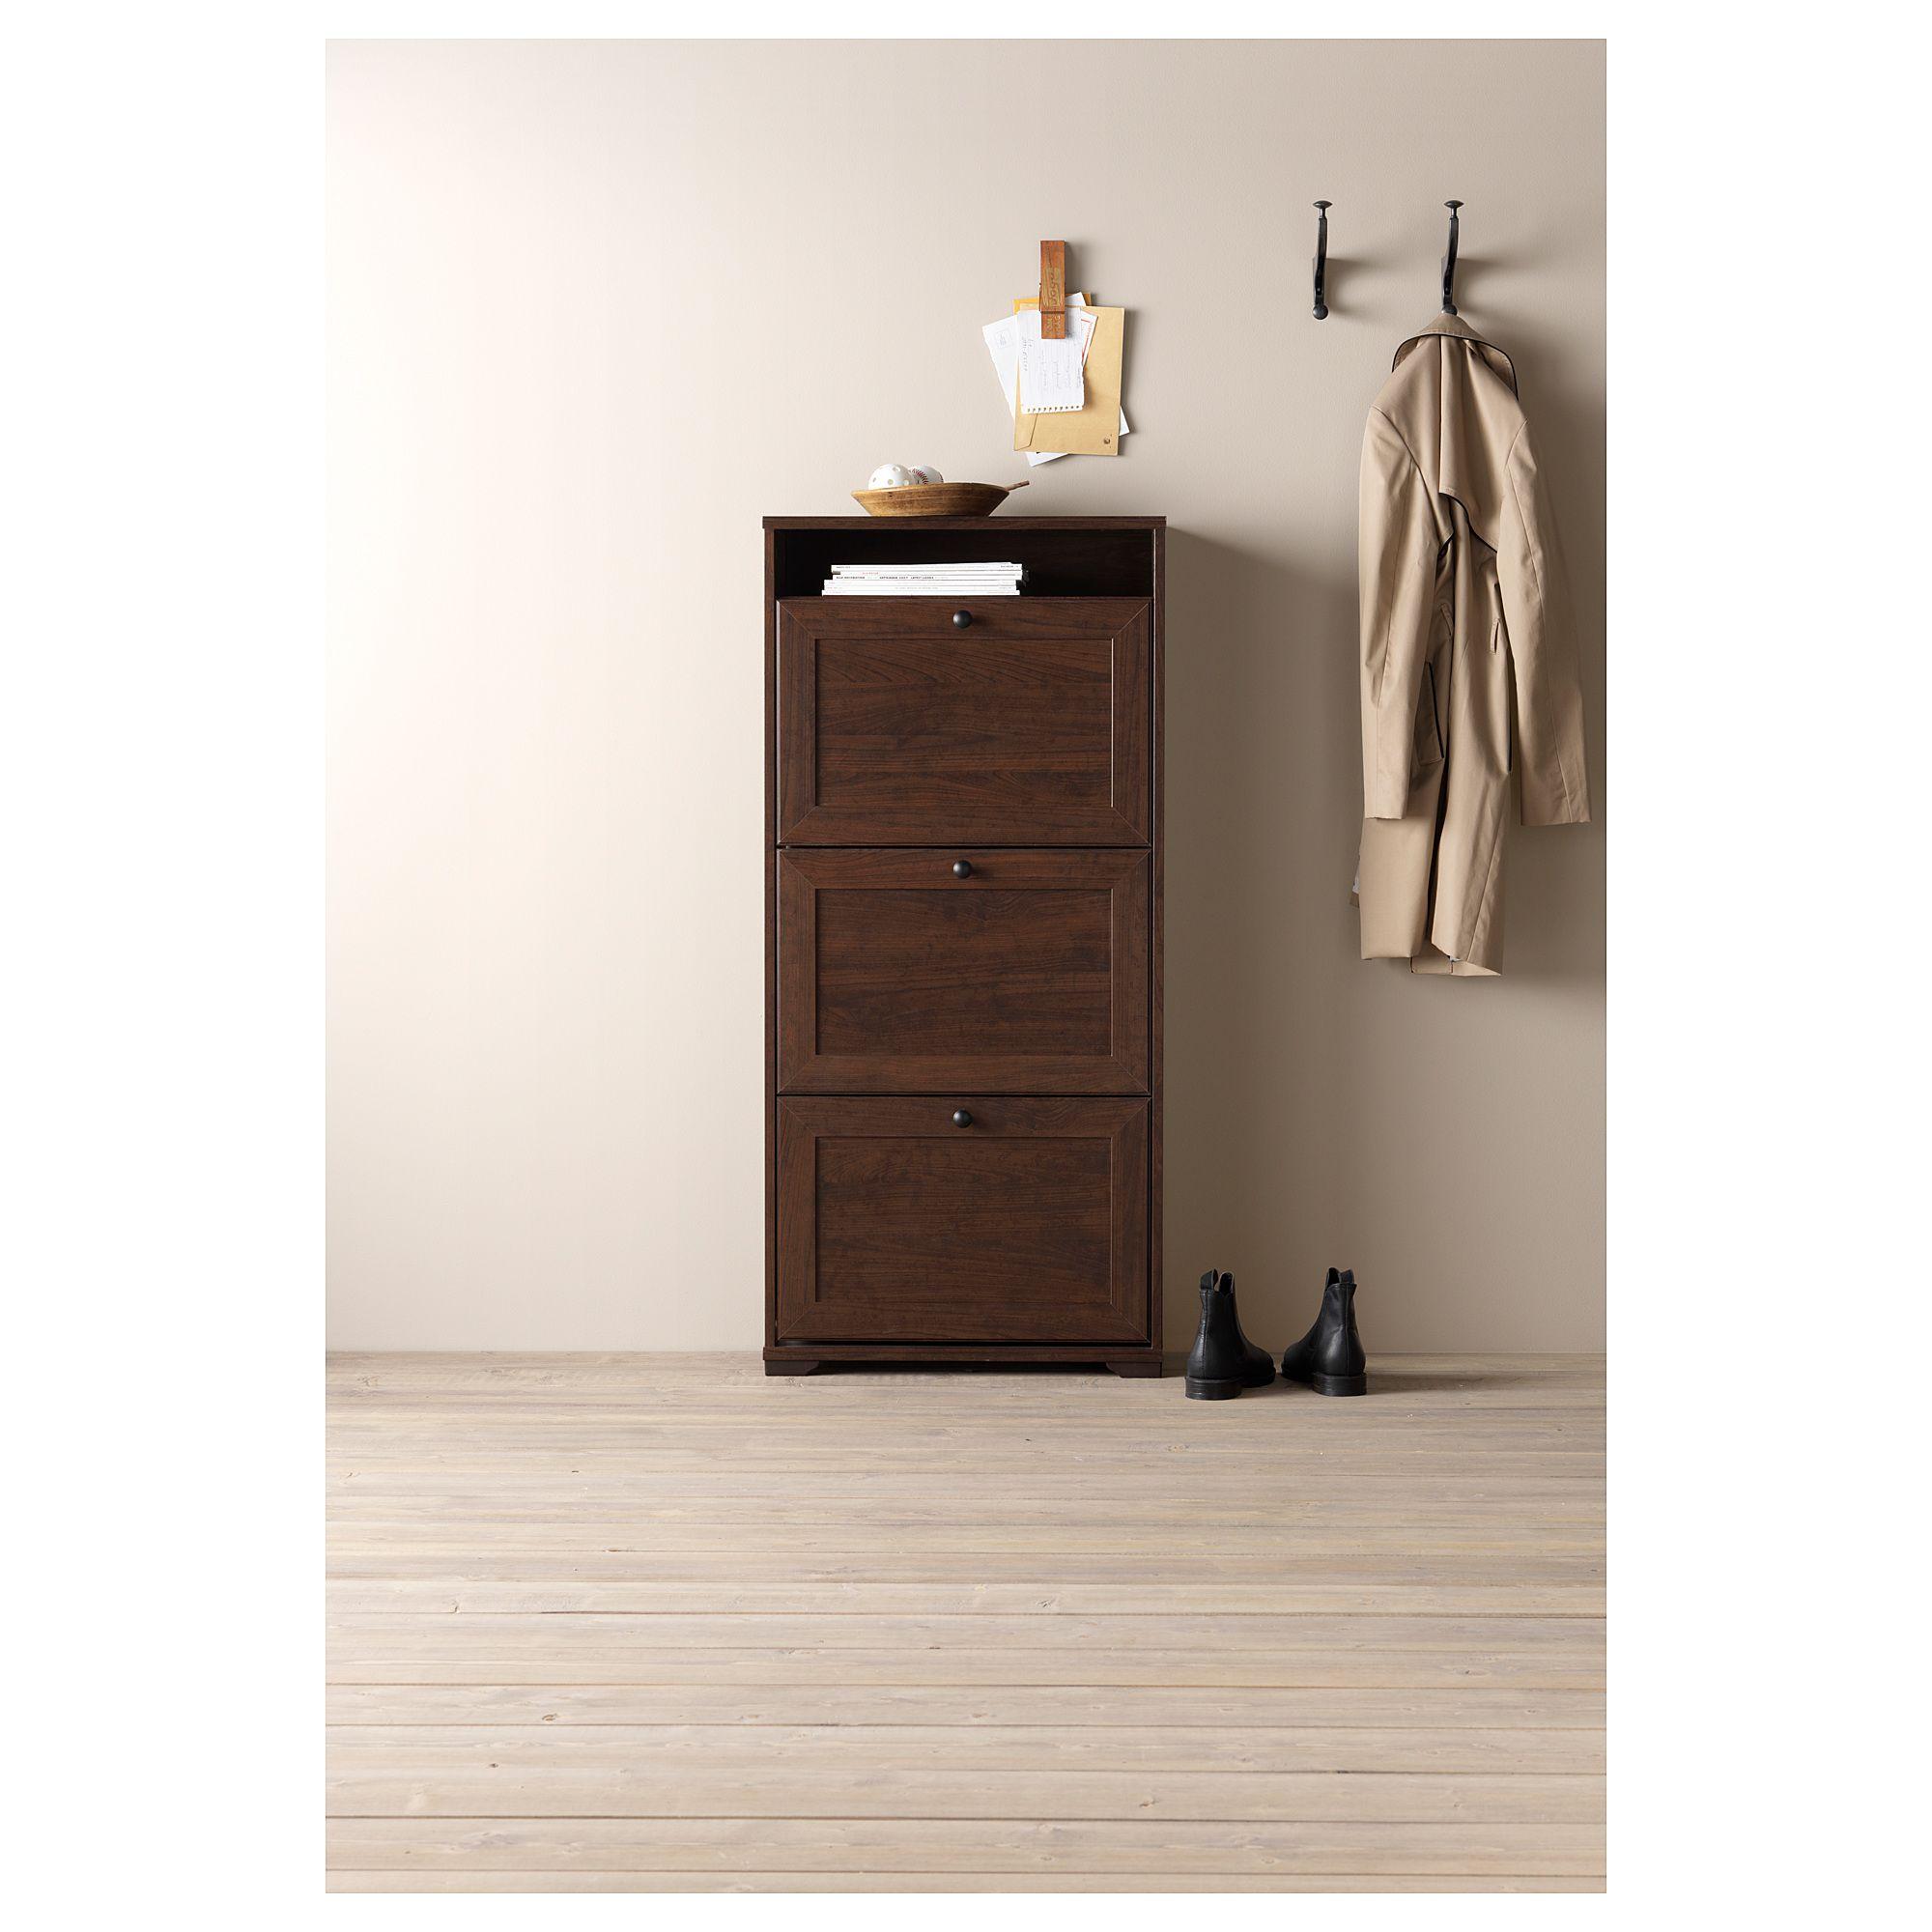 Armadietti In Plastica Ikea.Ikea Brusali Shoe Cabinet With 3 Compartment Brown Idee Ikea